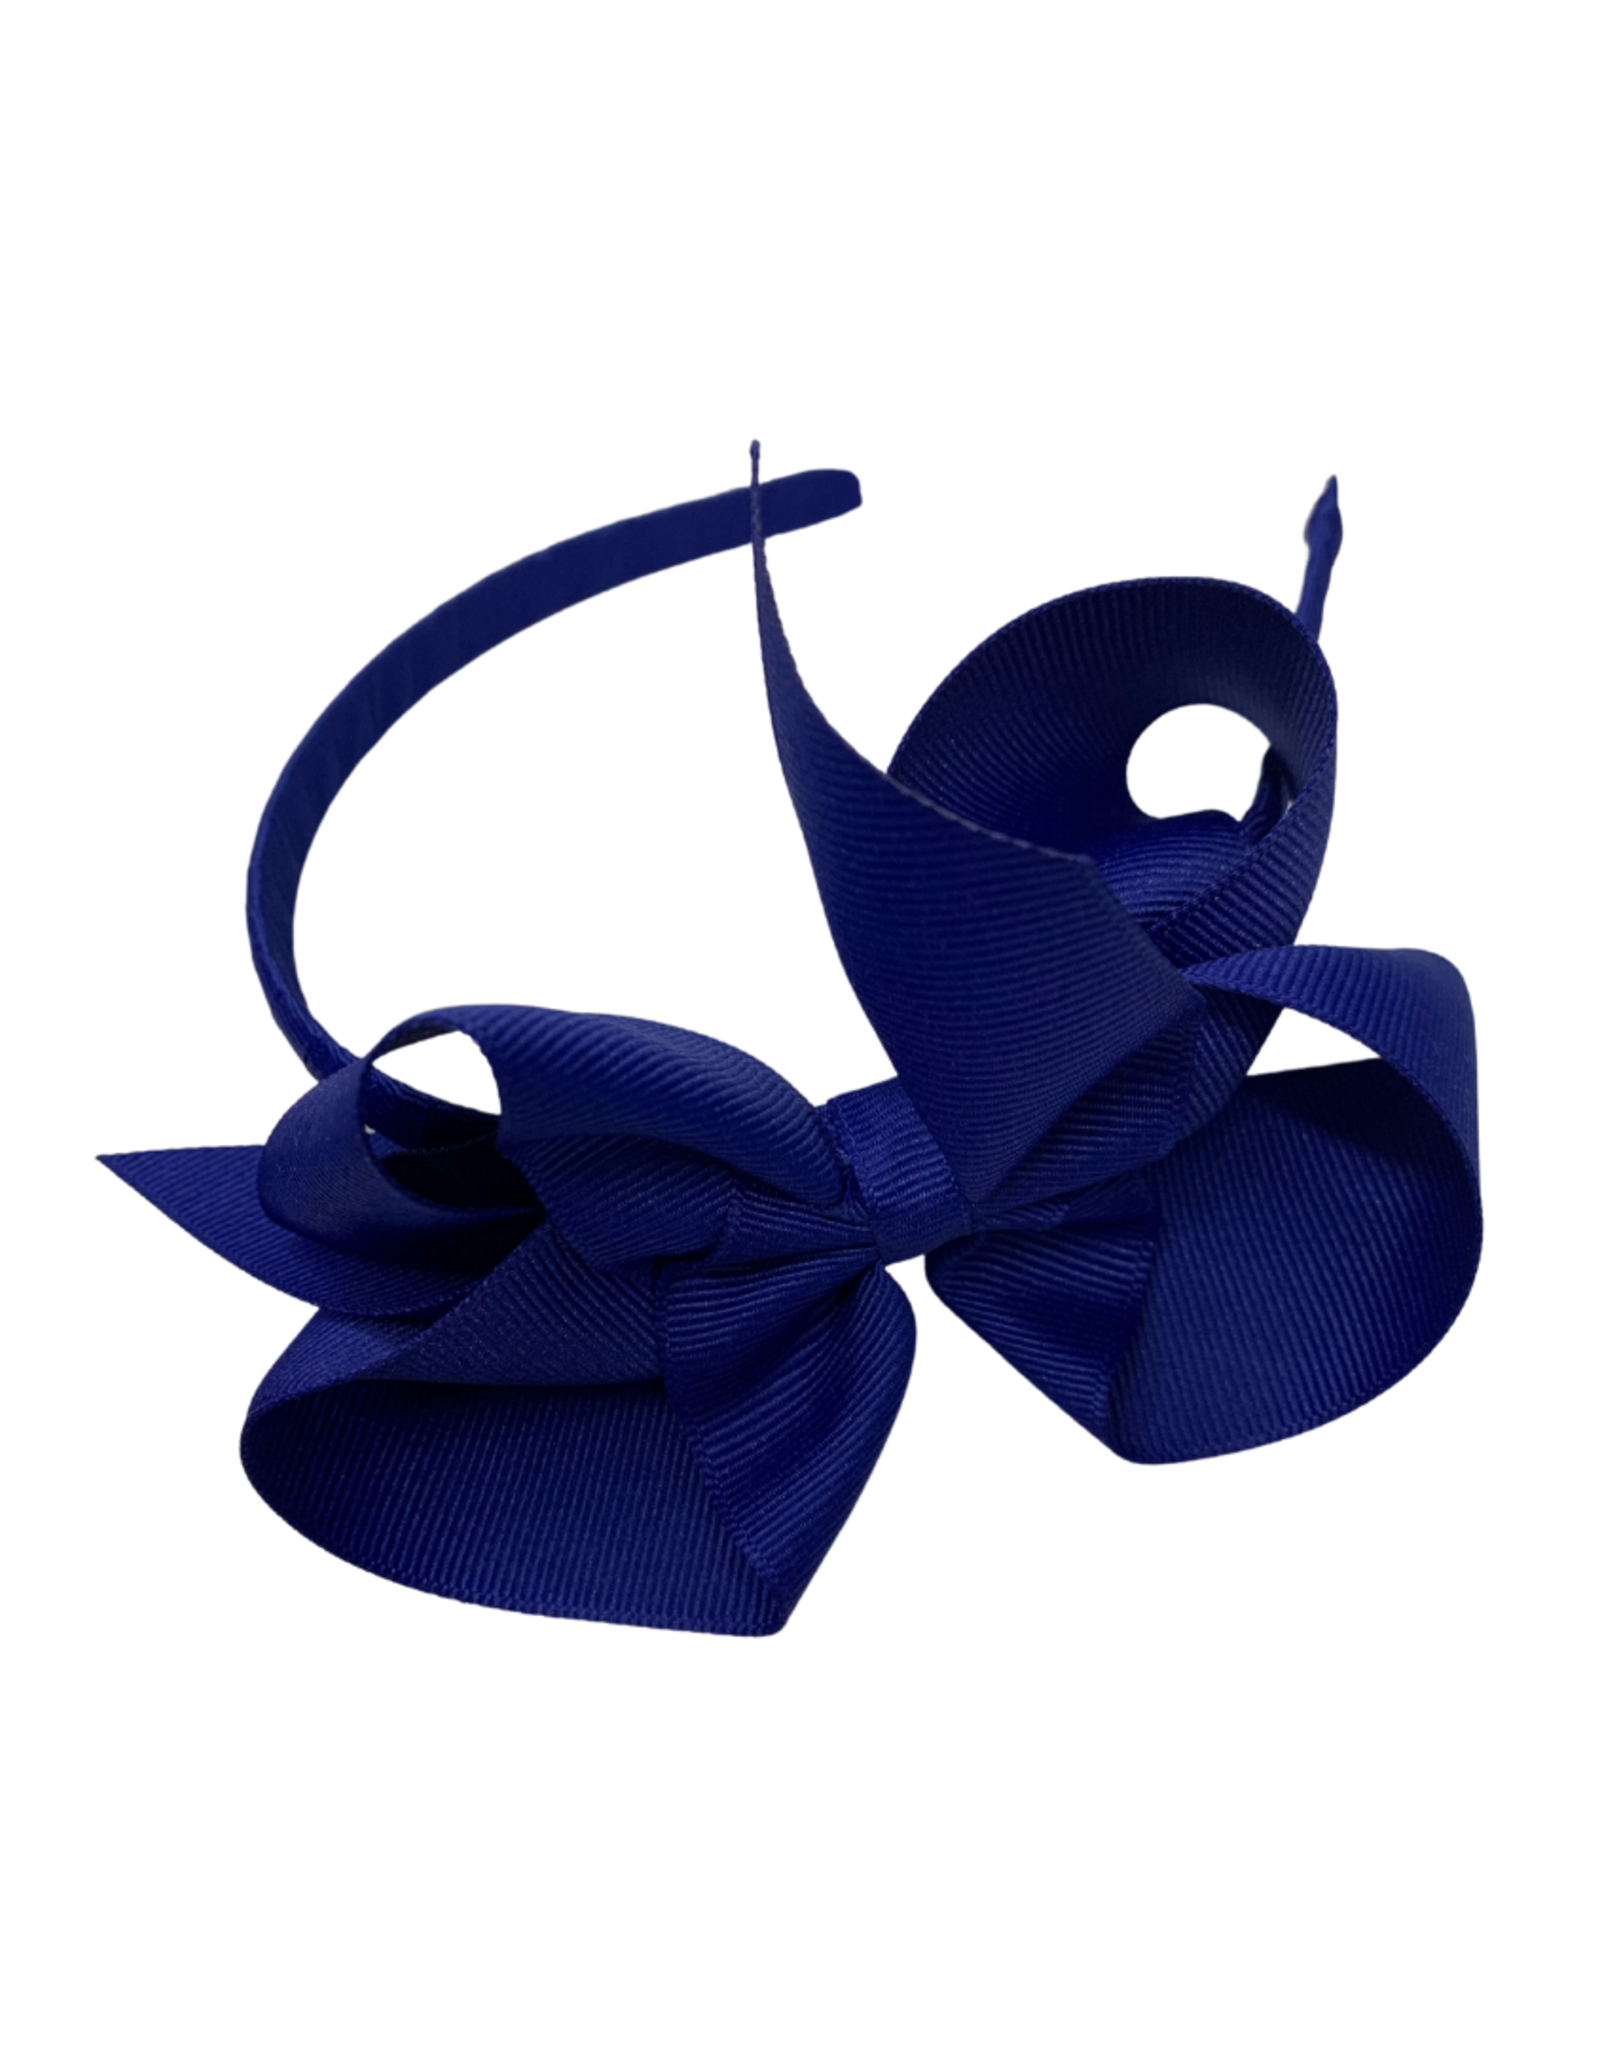 Bows Arts Big Classic Bow Headband - Royal